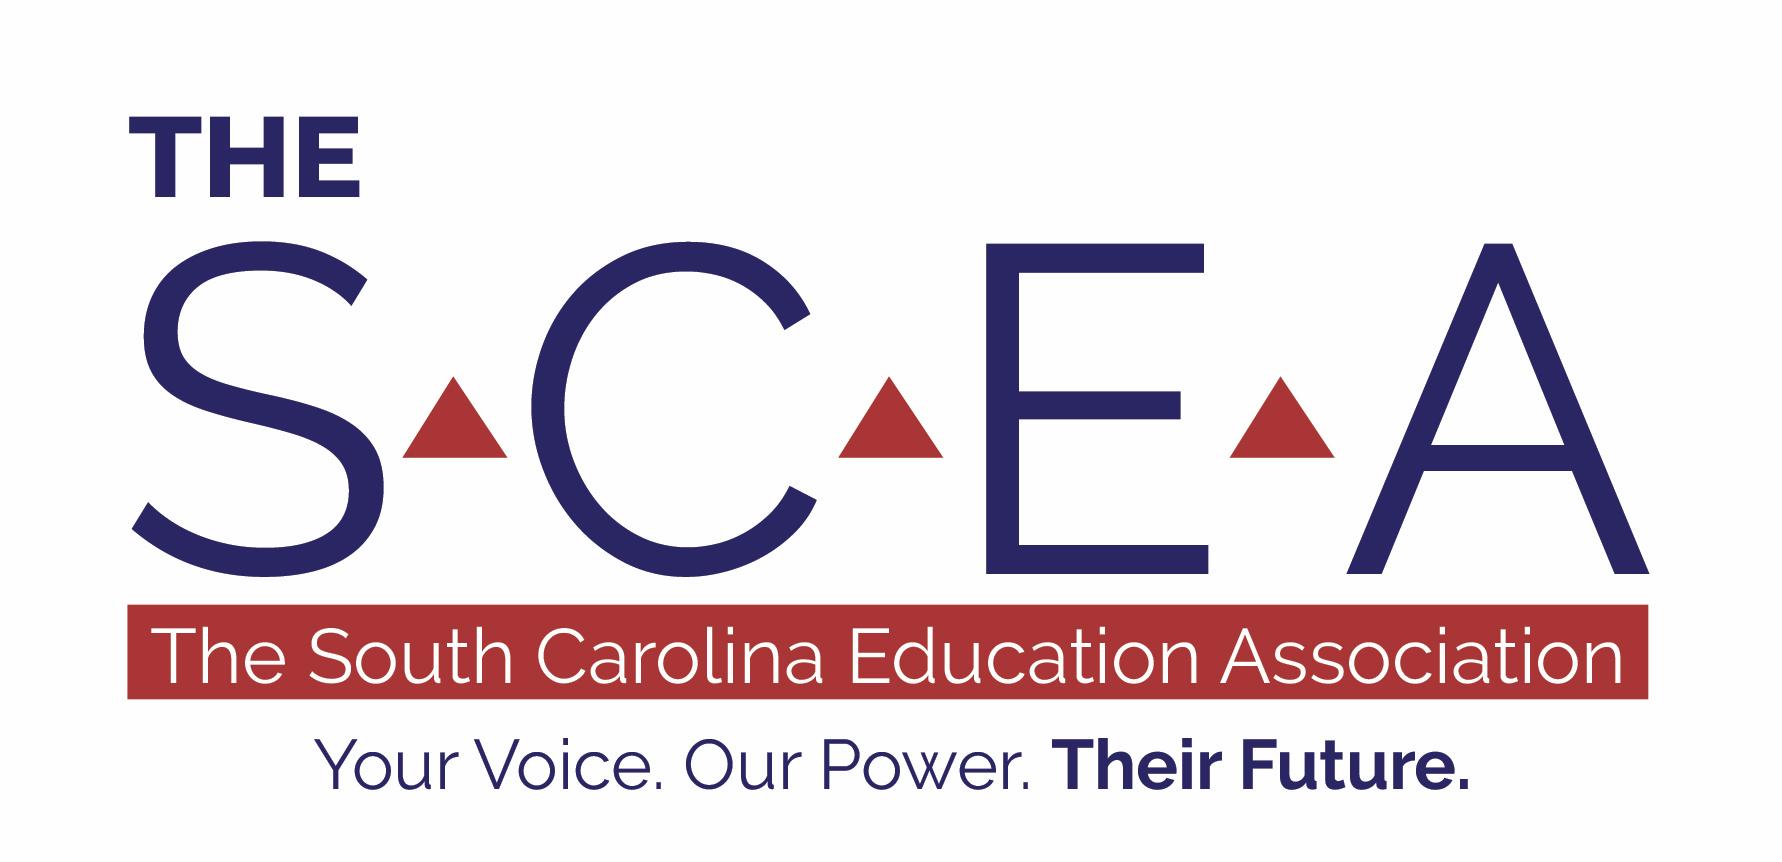 The South Carolina Education Association Logo